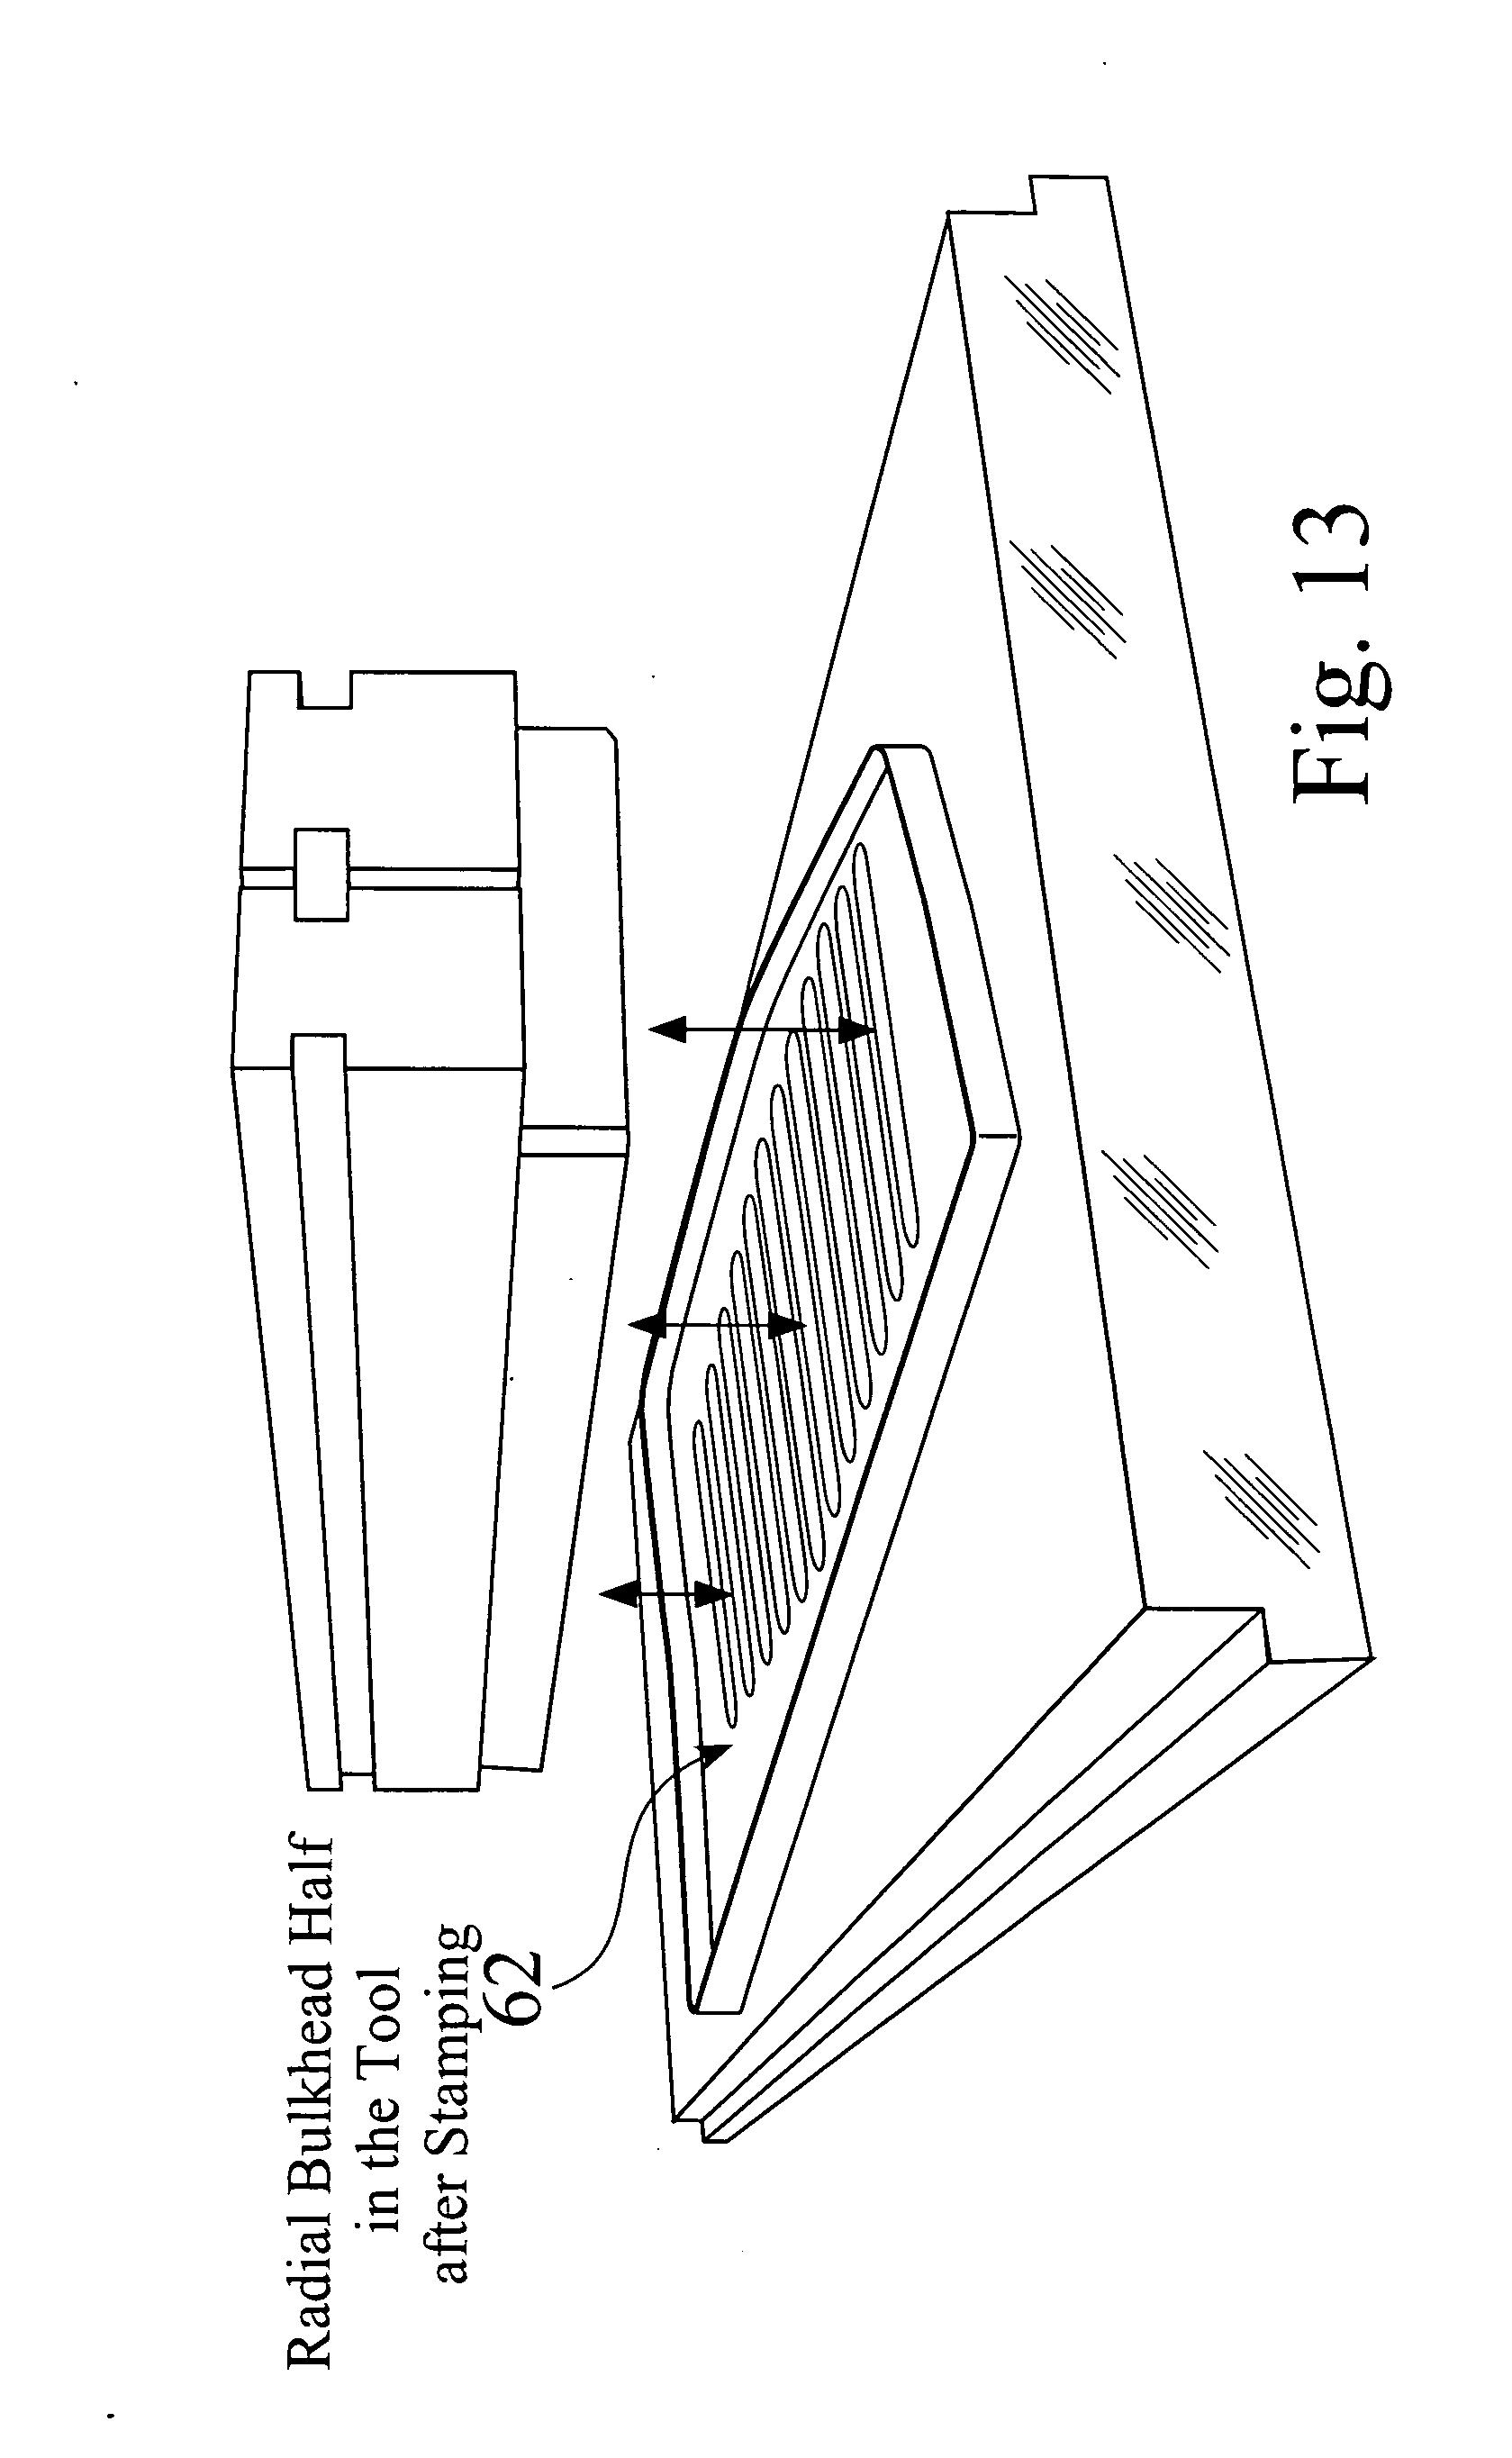 Cub Cadet 1330 Wiring Diagram Schematics Pto Simple Guide About U2022 Switch